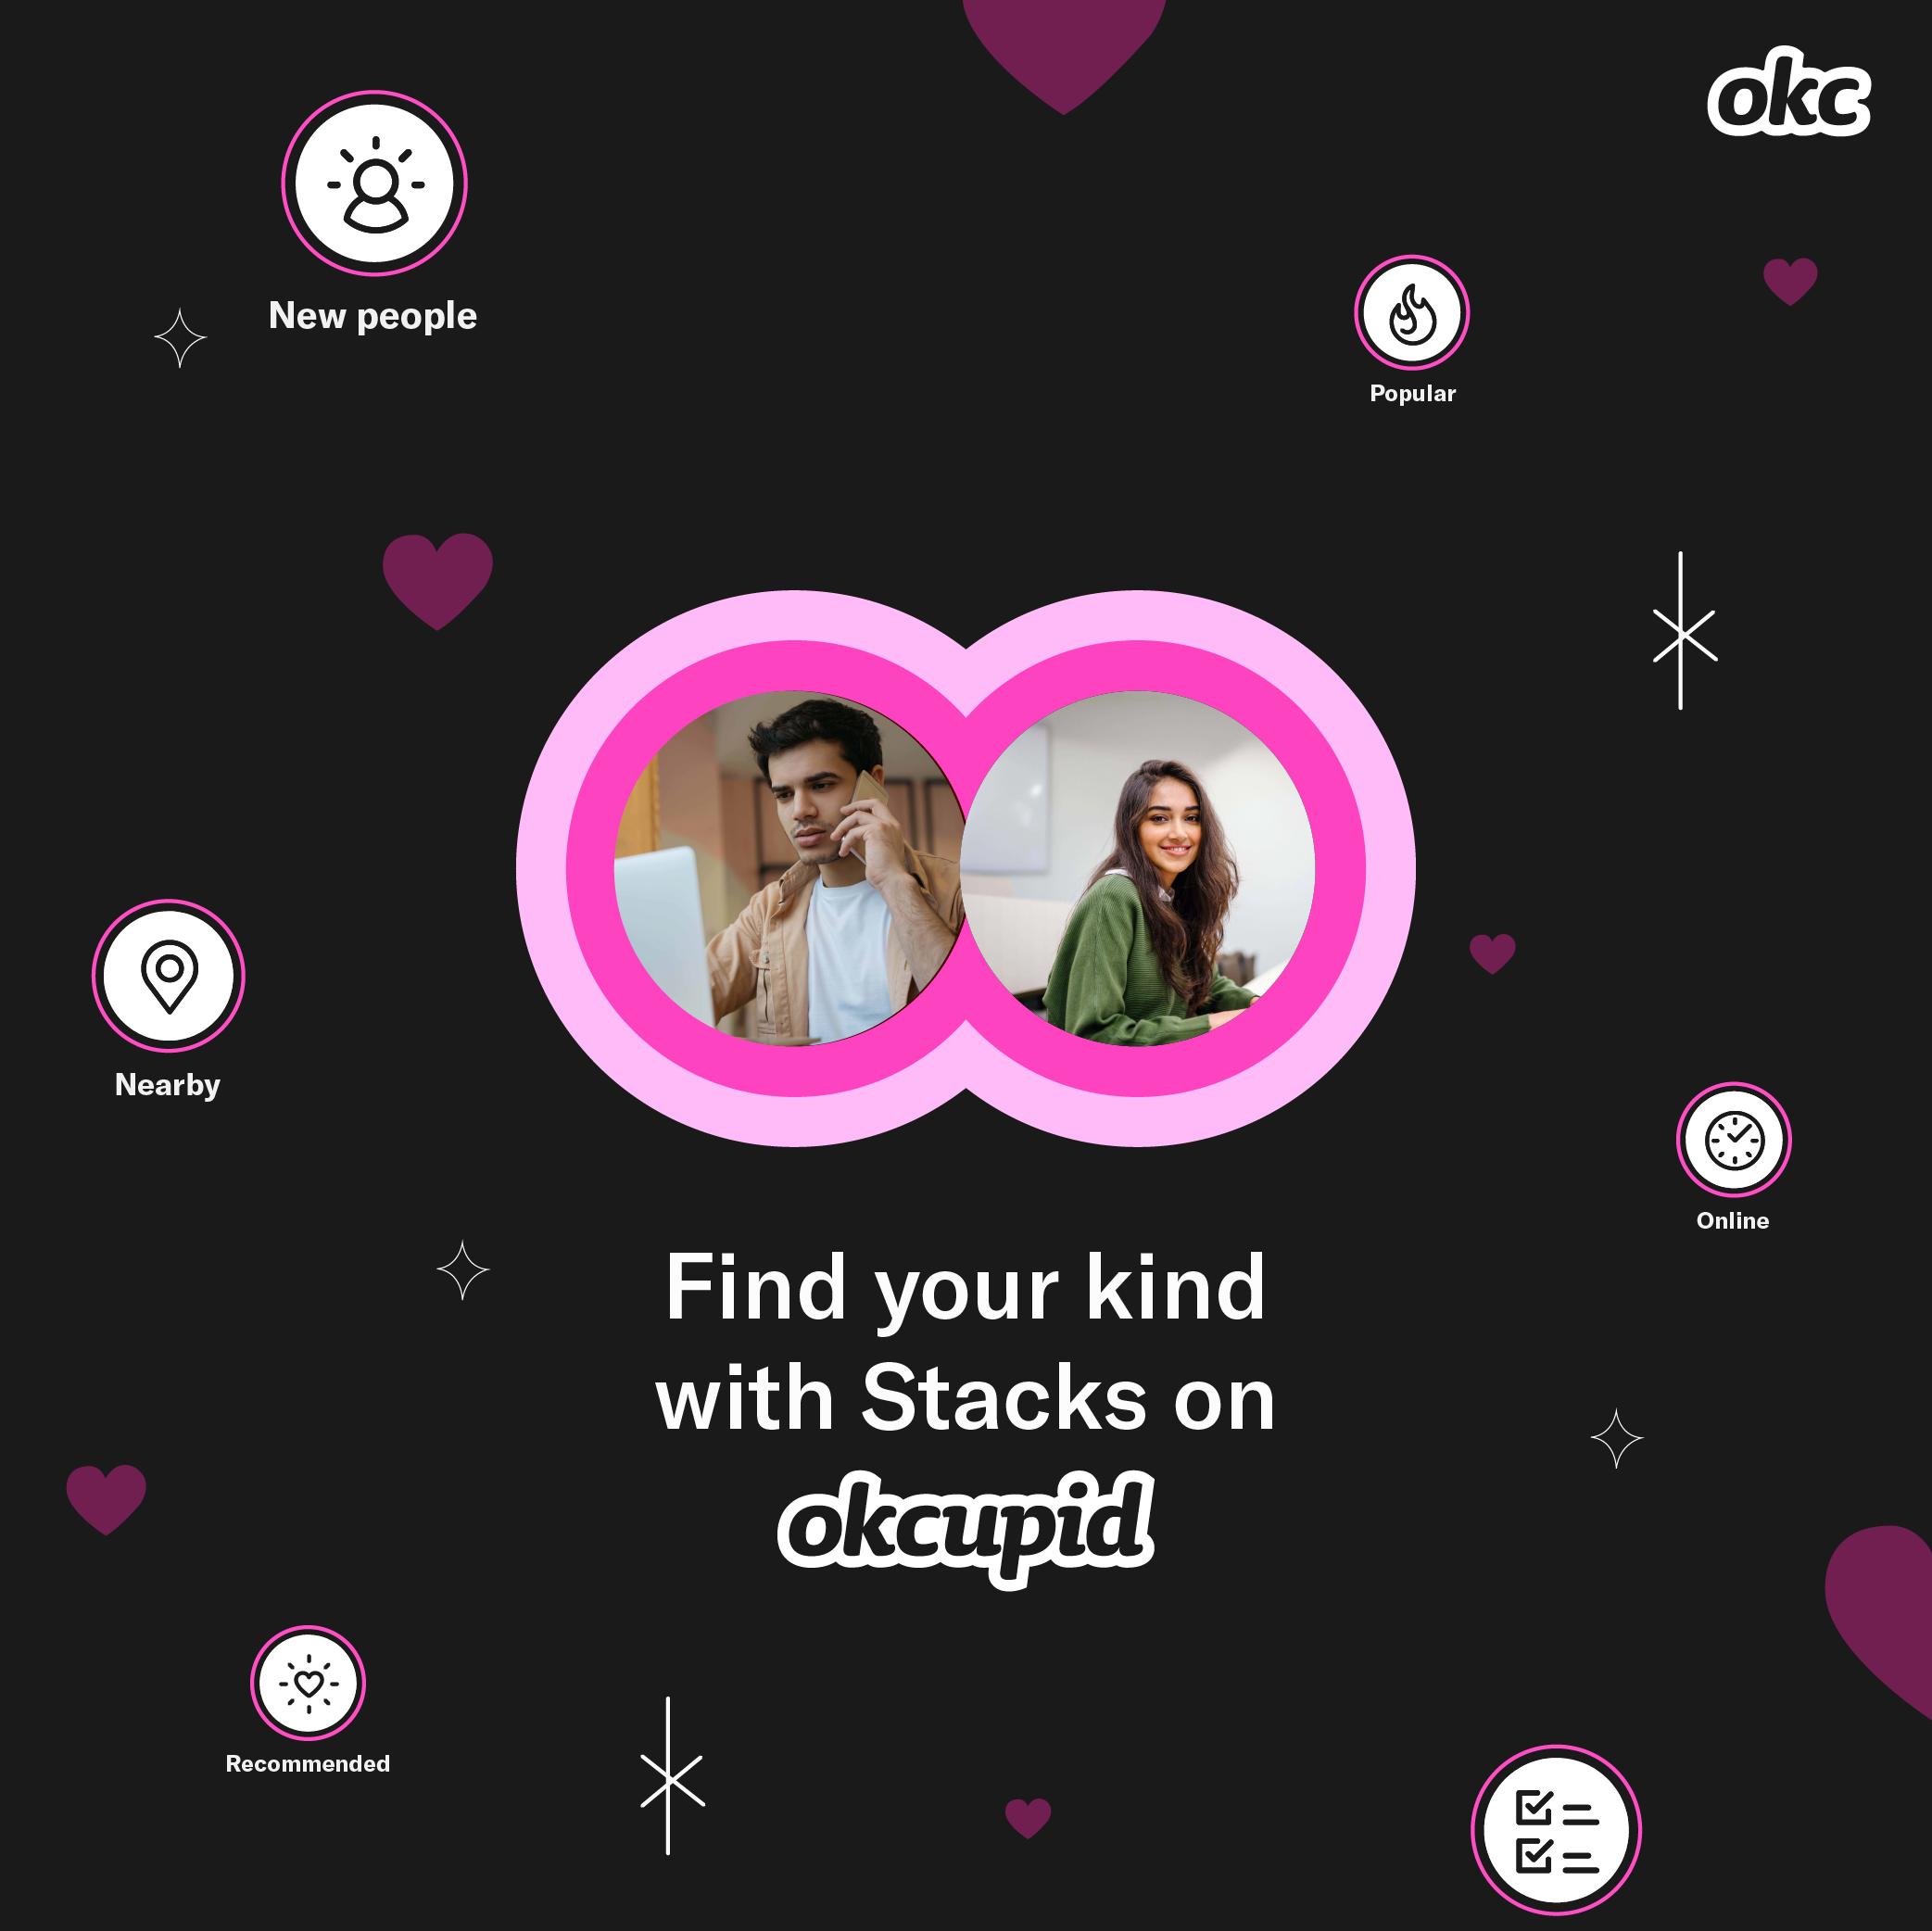 OkCupid Begins Roll-Out of Major 'Stacks' Redesign